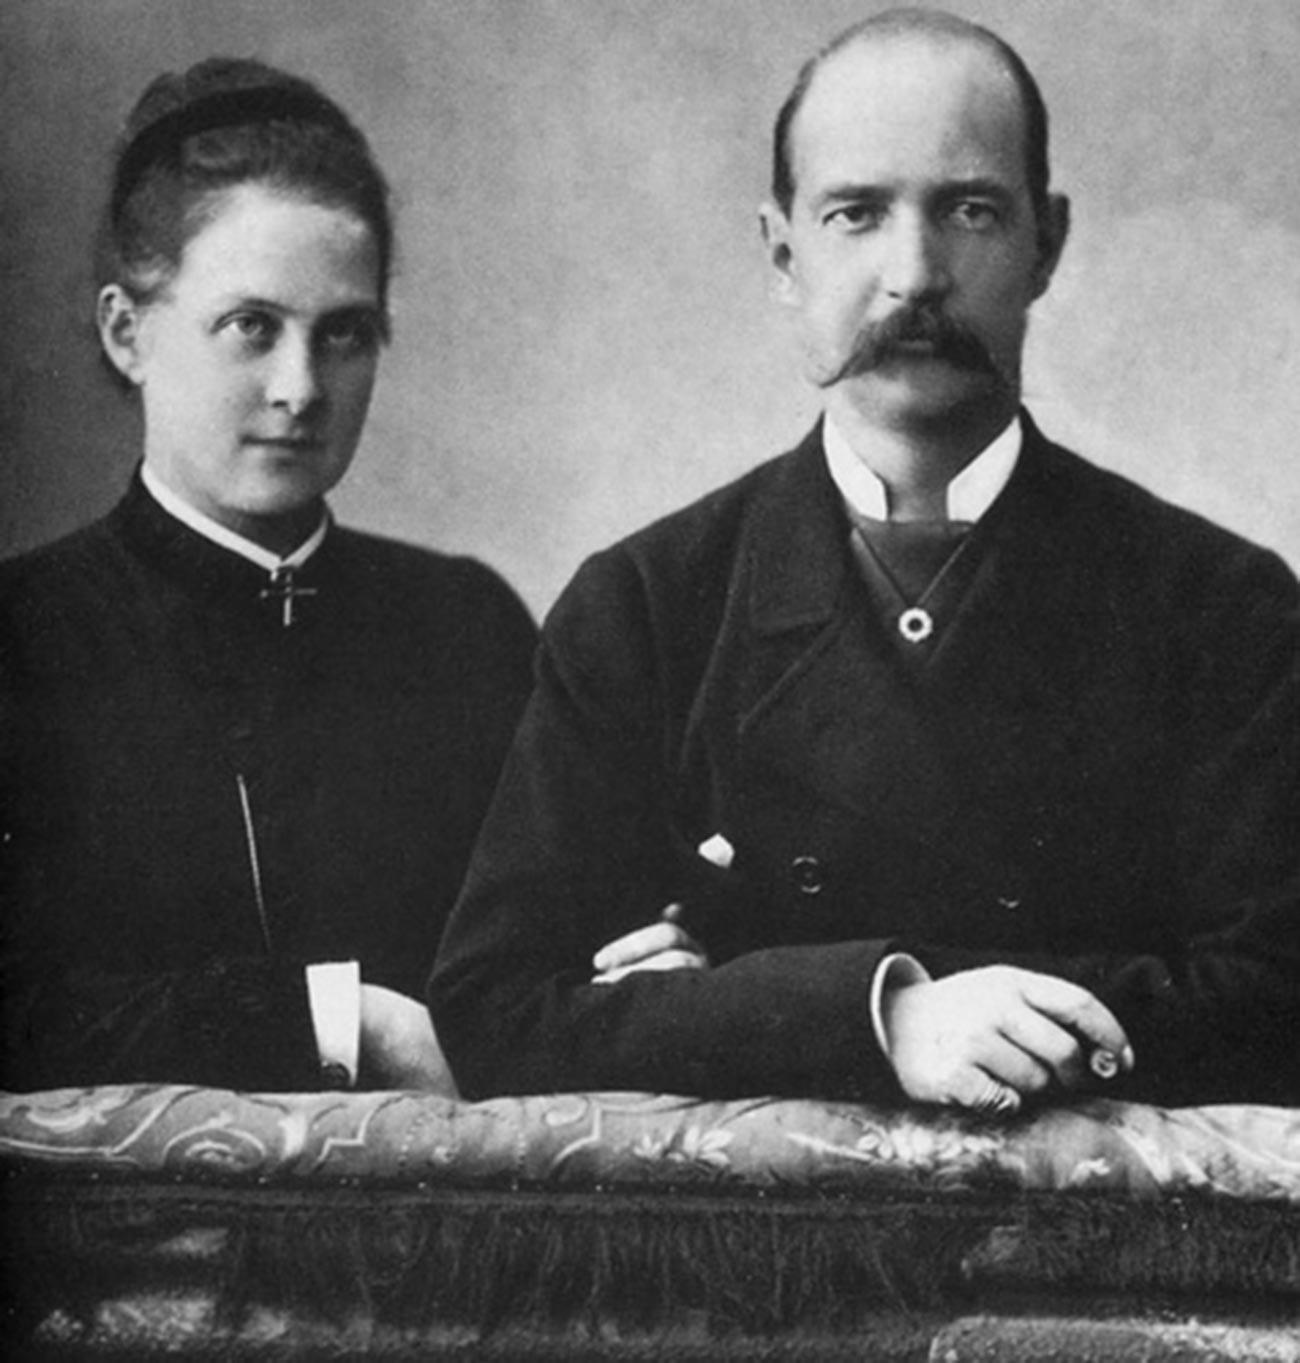 Georg I. von Griechenland (v.r) und seine Frau Olga Konstantinowna (v.l).